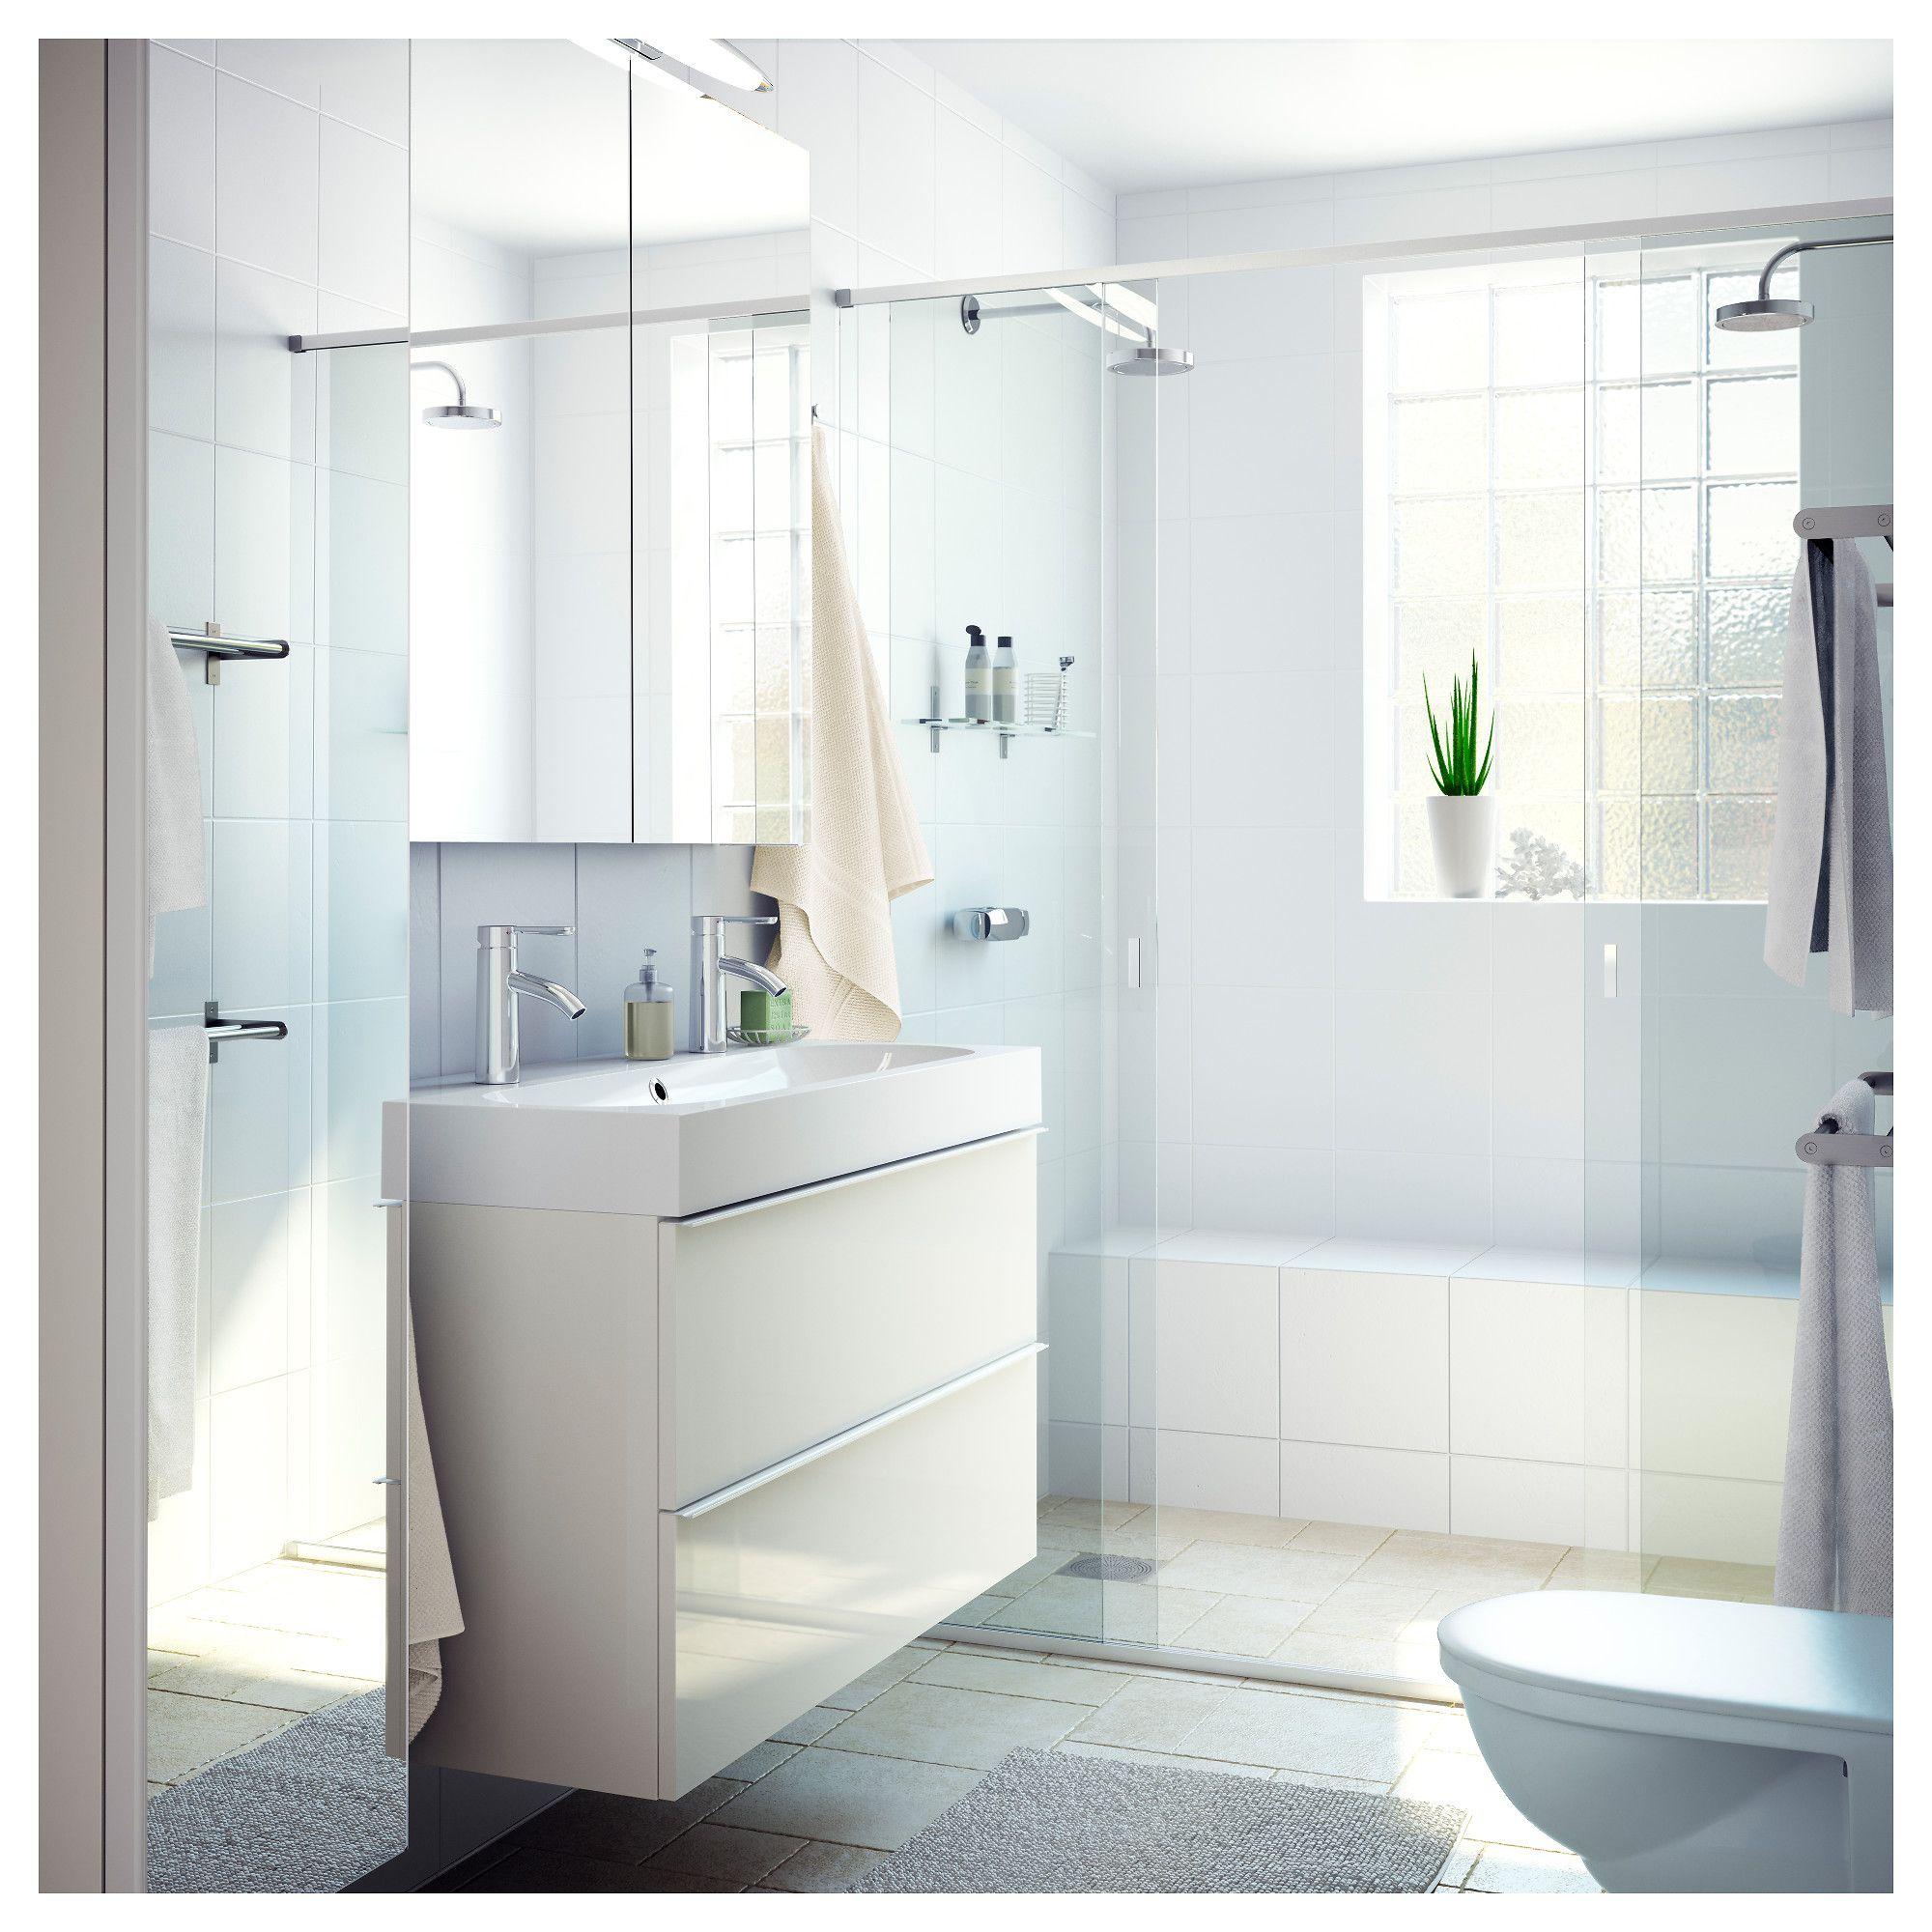 Pin by Hailing Lee on IKEA-Bathroom | Pinterest | Sinks, Chrome ...